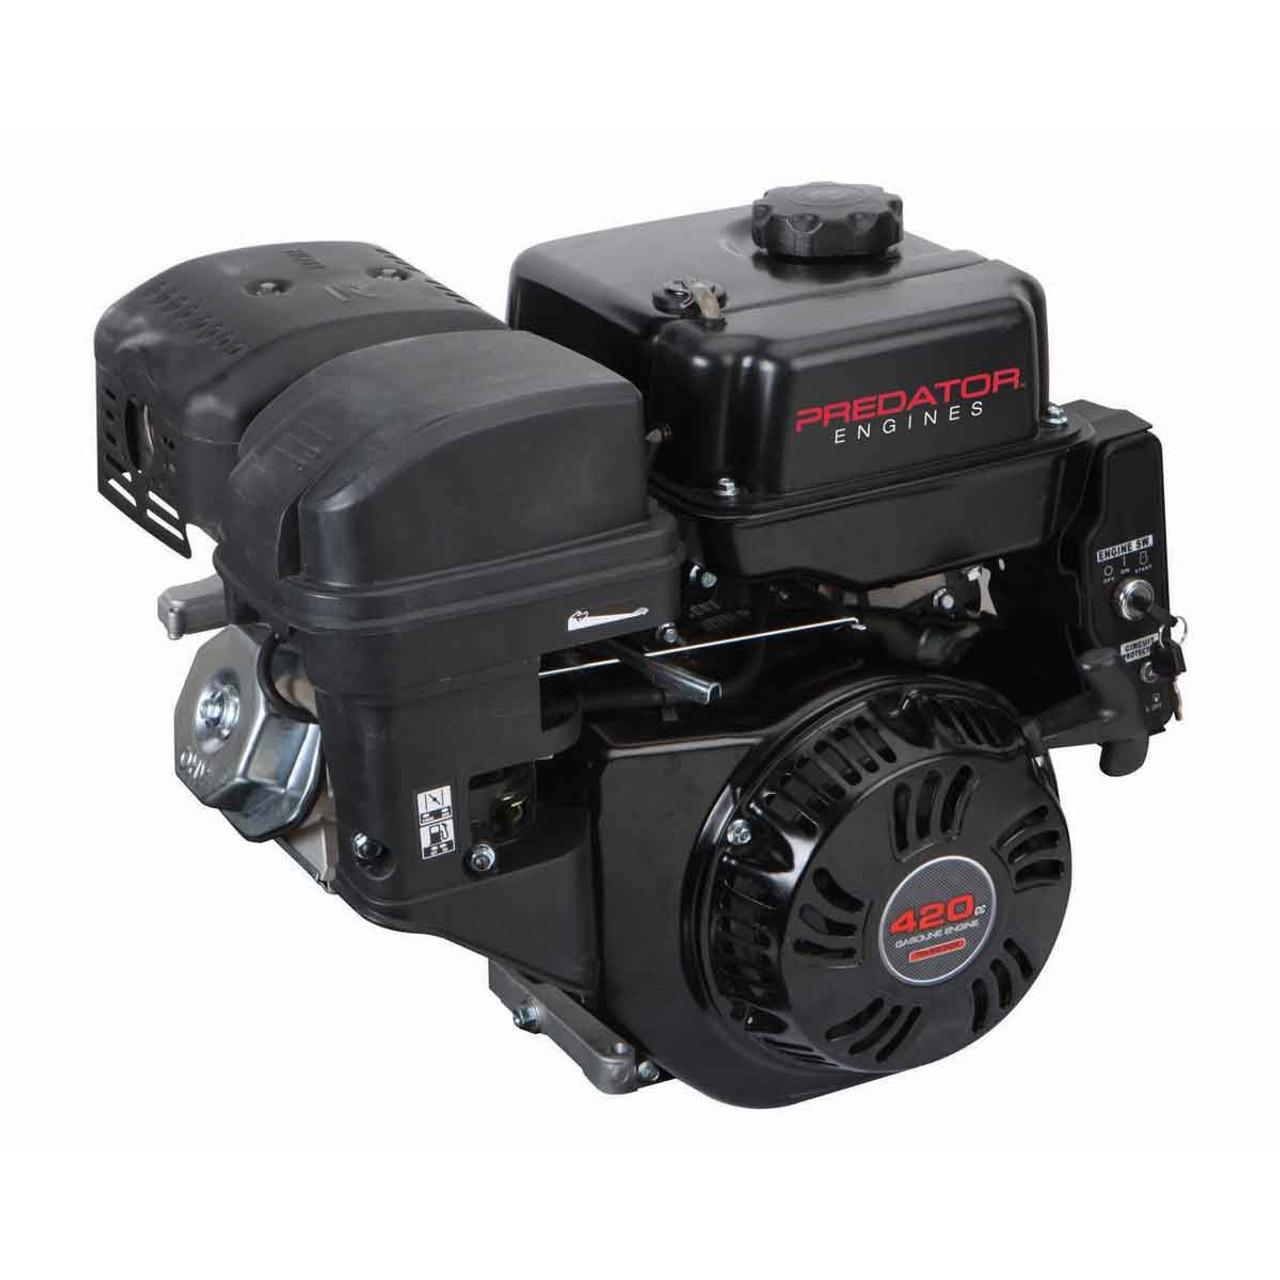 Predator Engine 420cc (13 HP) Harbor Freight